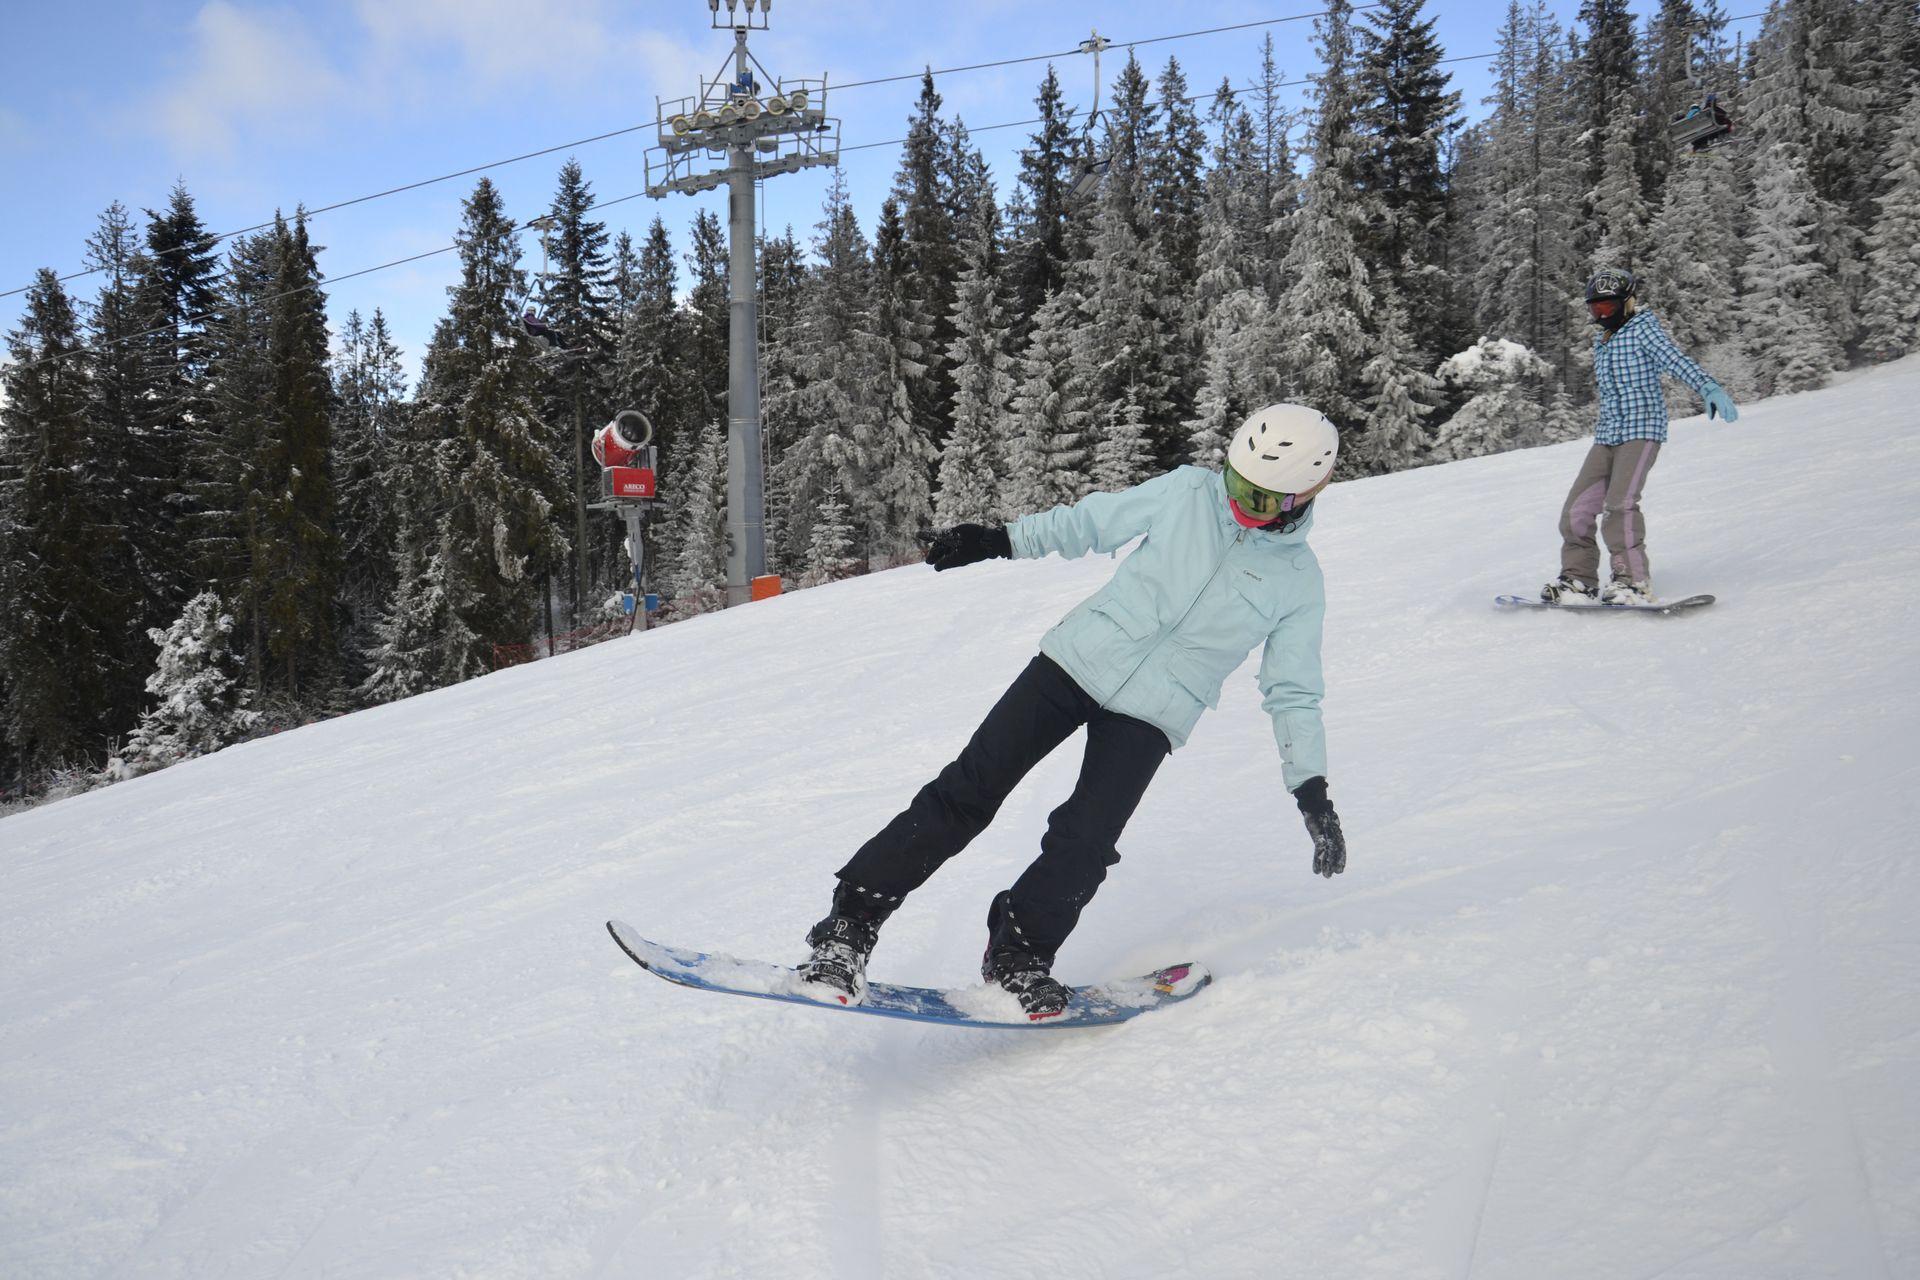 CarTourist_narty-snowboard_2013-foto-5